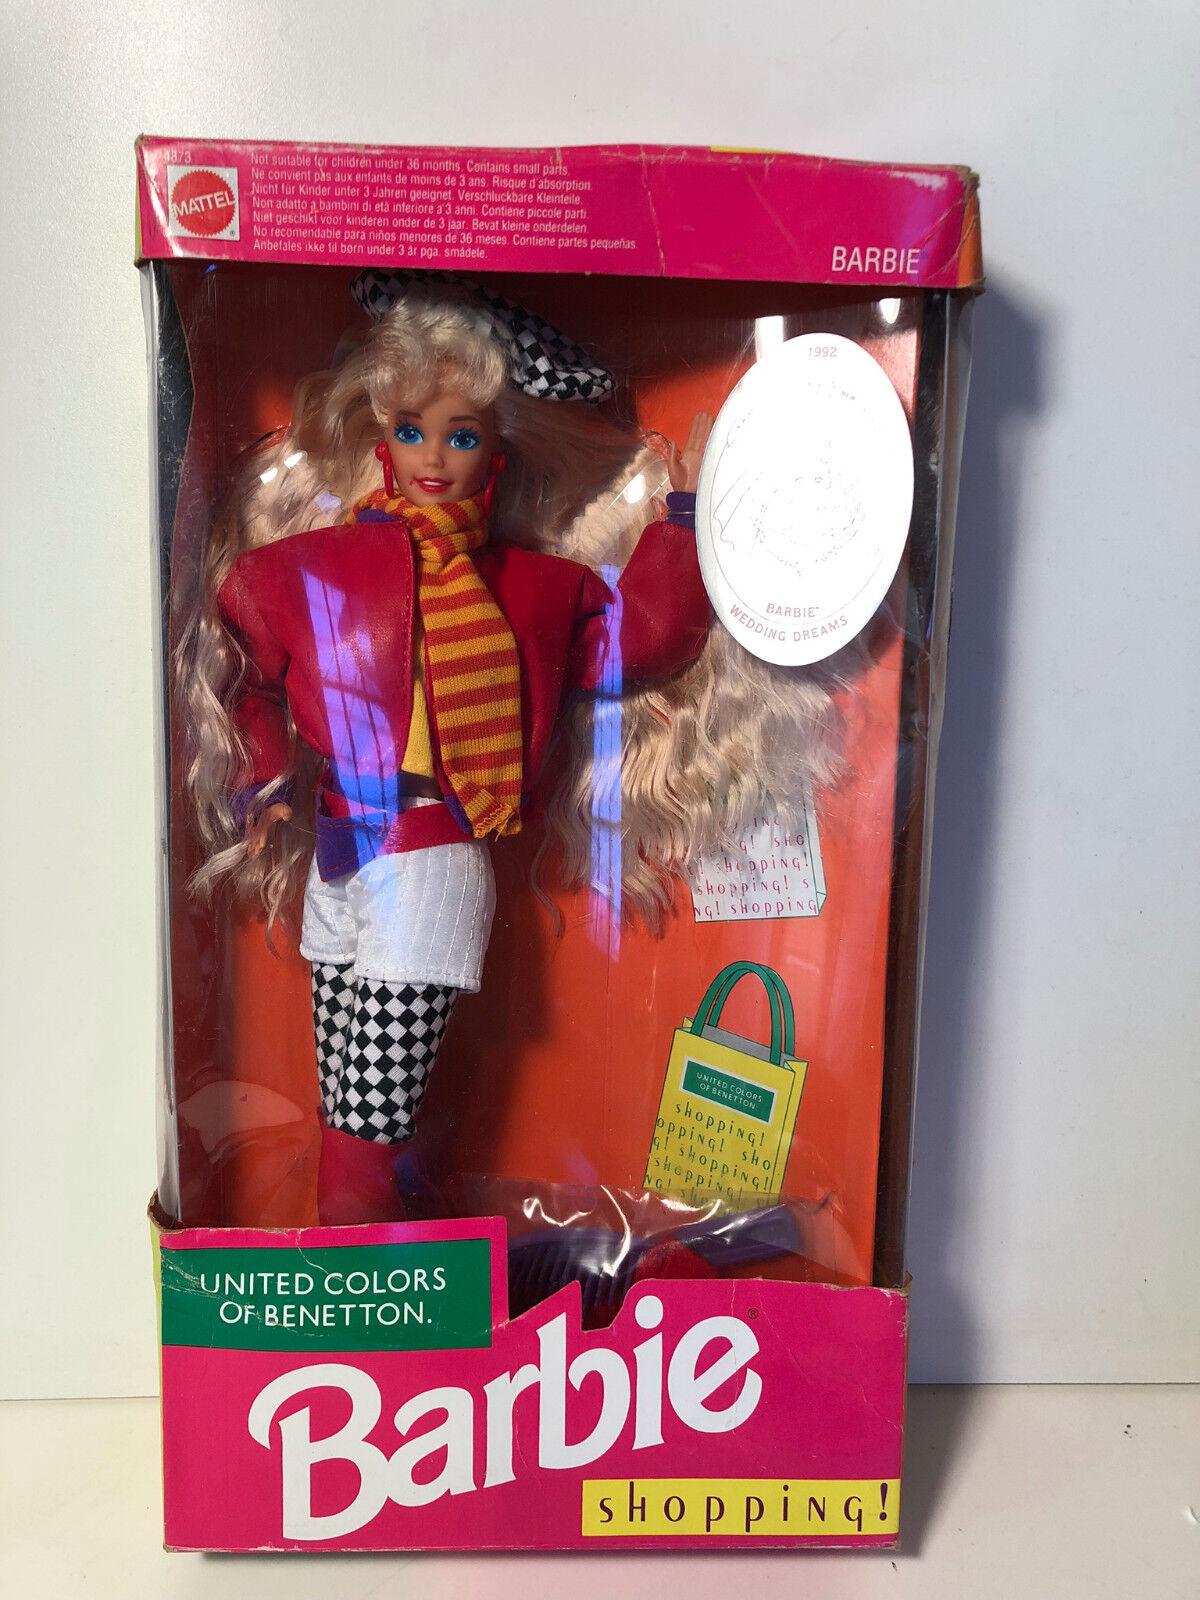 Barbie   Barbie UNITED FarbeS OF BENETTON SHOPPING  1991  NIB 4873 ec43de